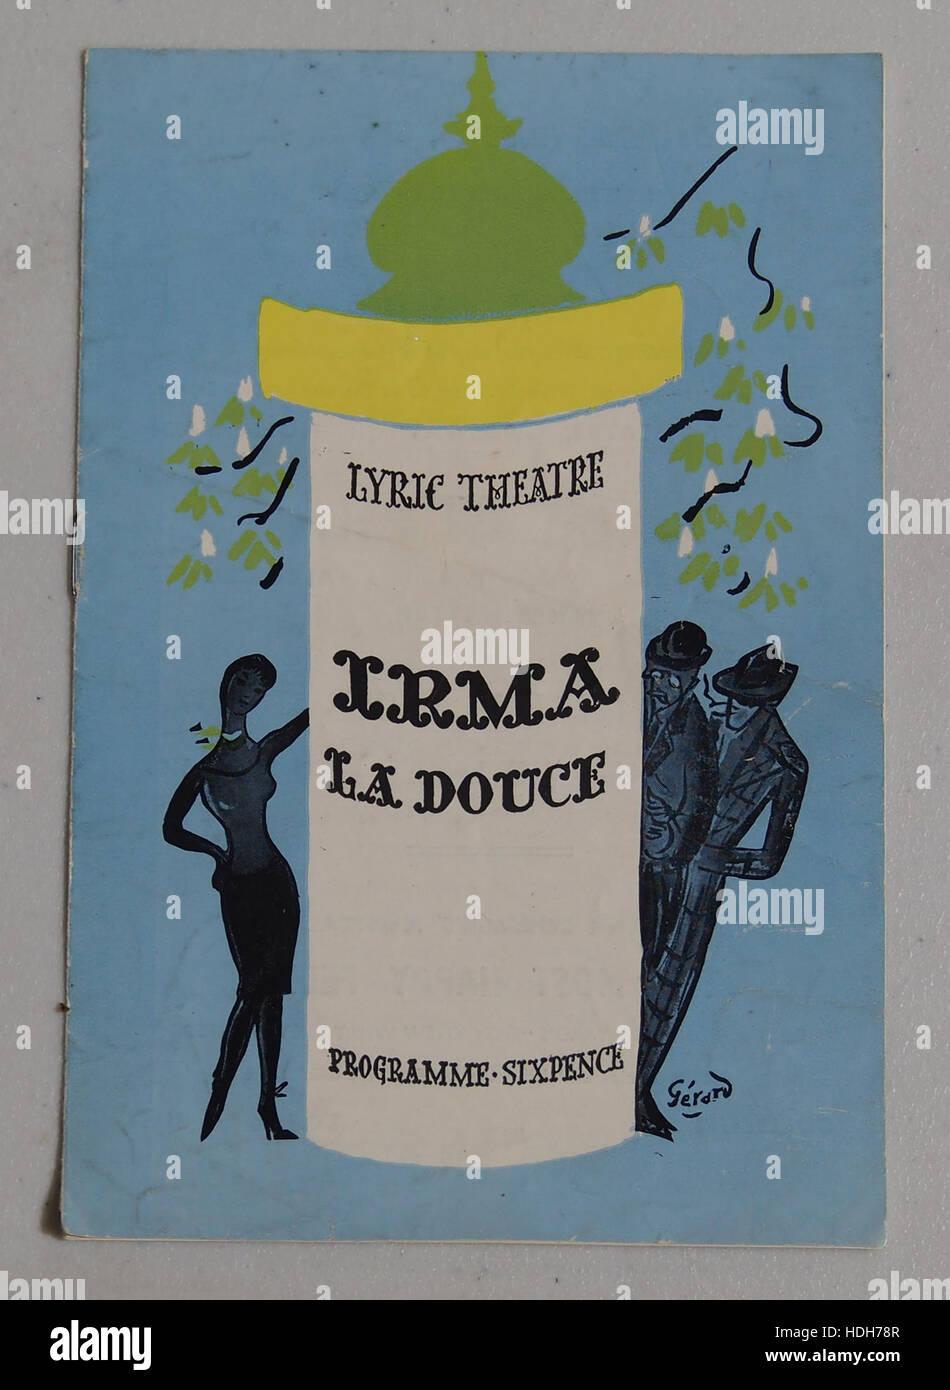 Irma La Douce programma boekje Stockbild